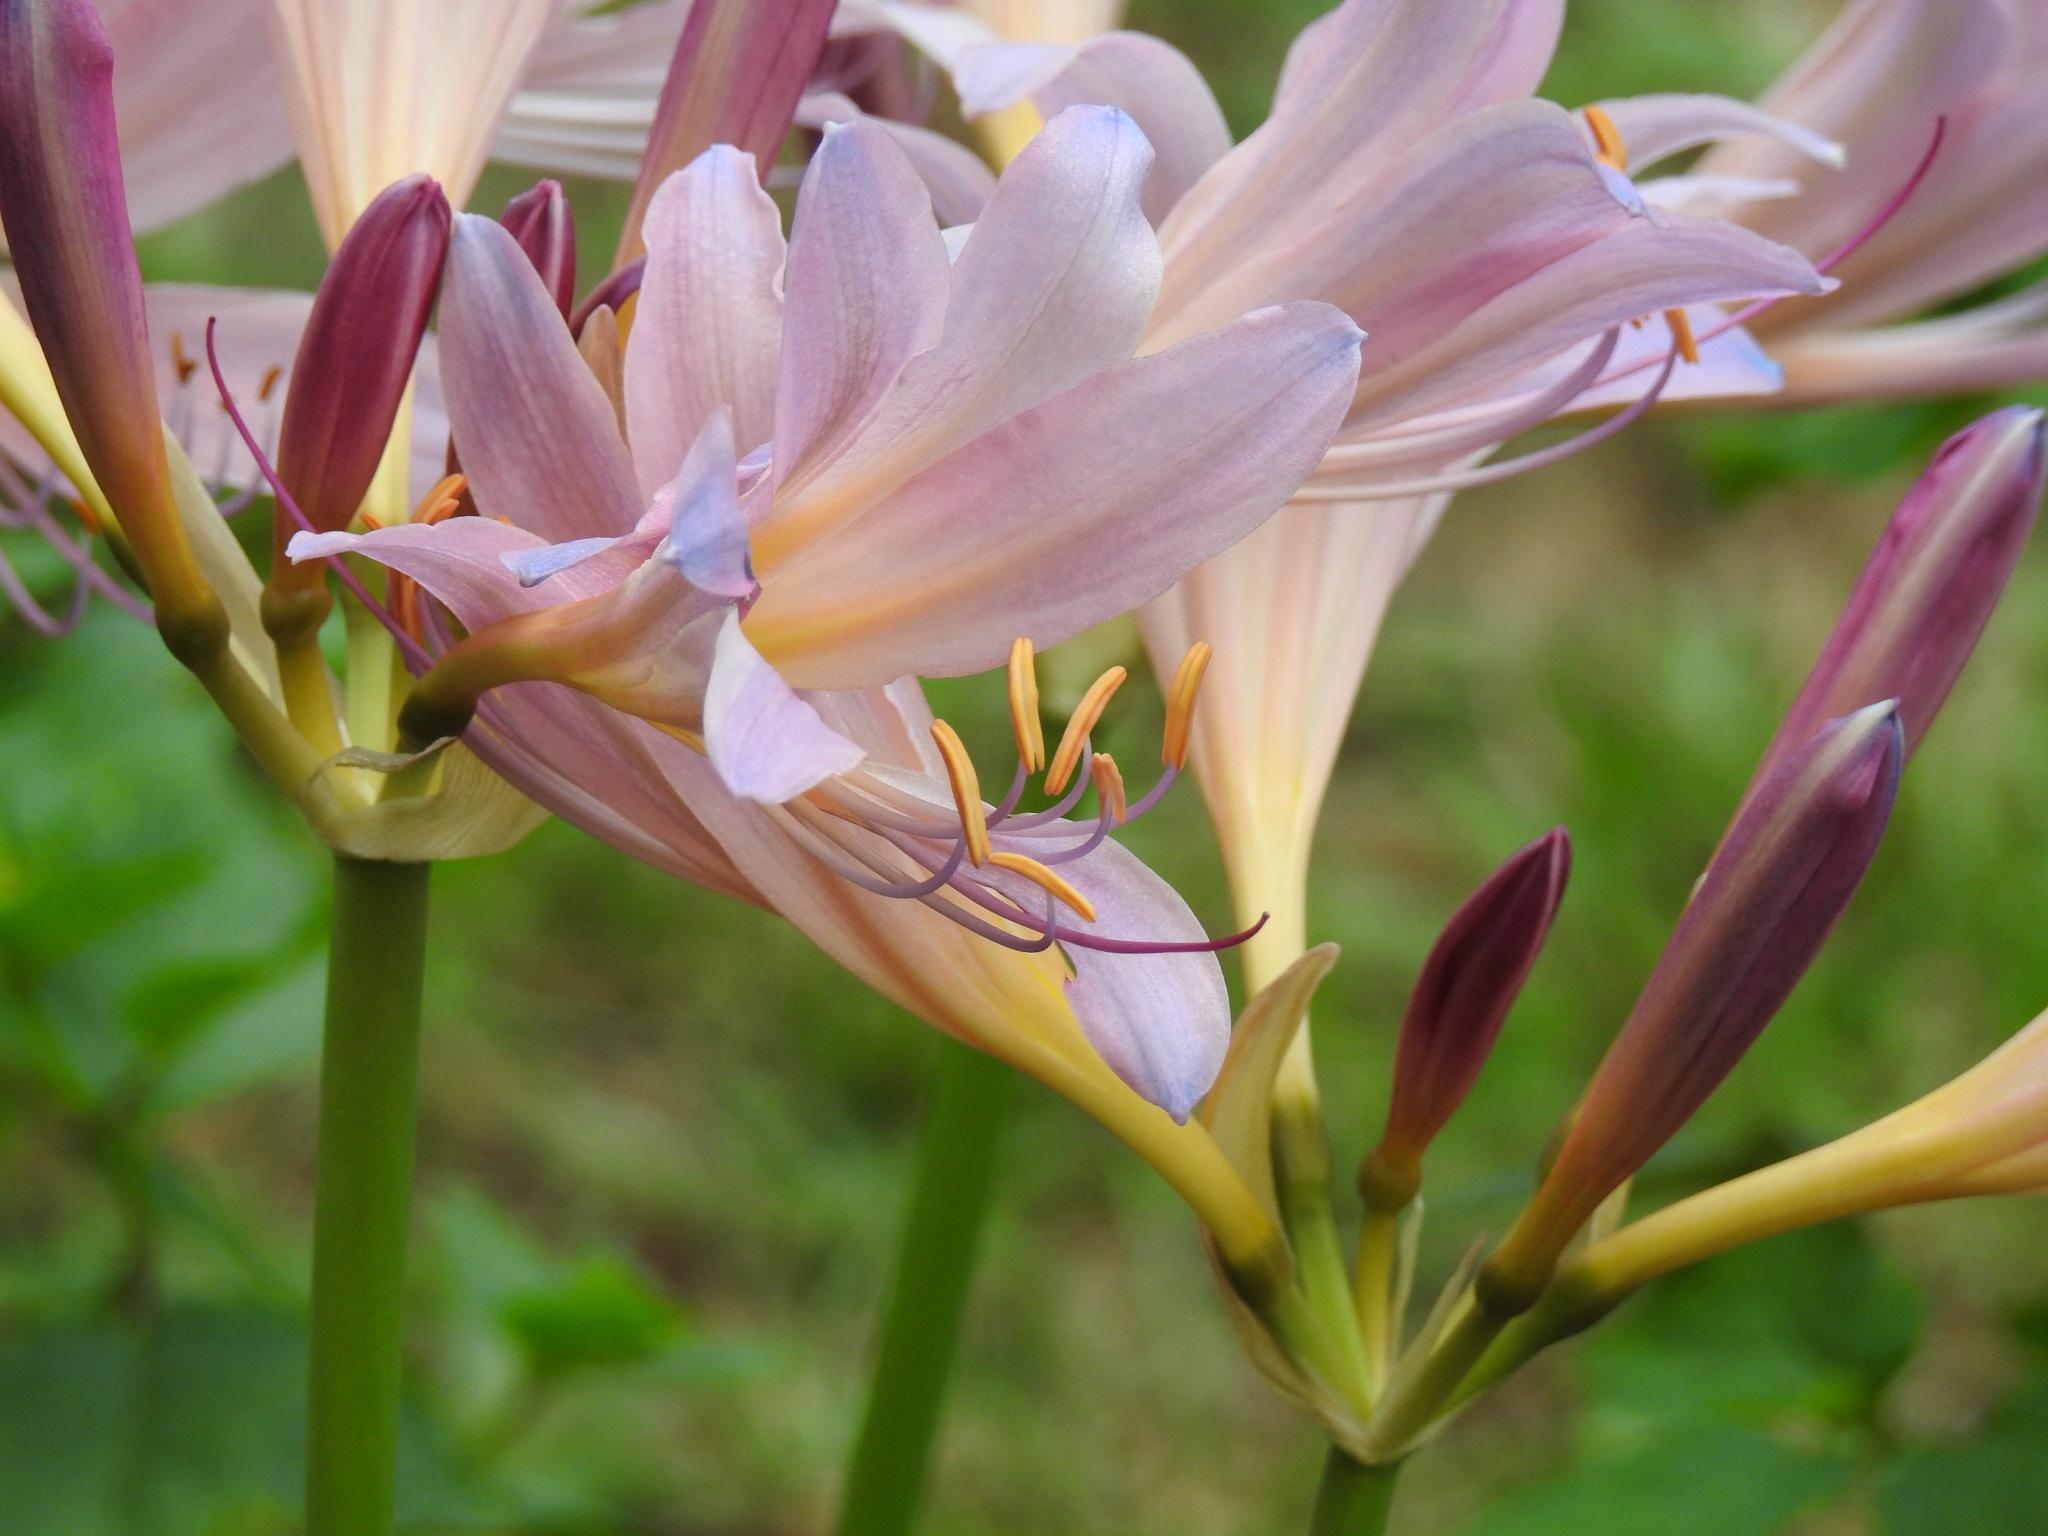 Belladonna Lily by KarenBranch